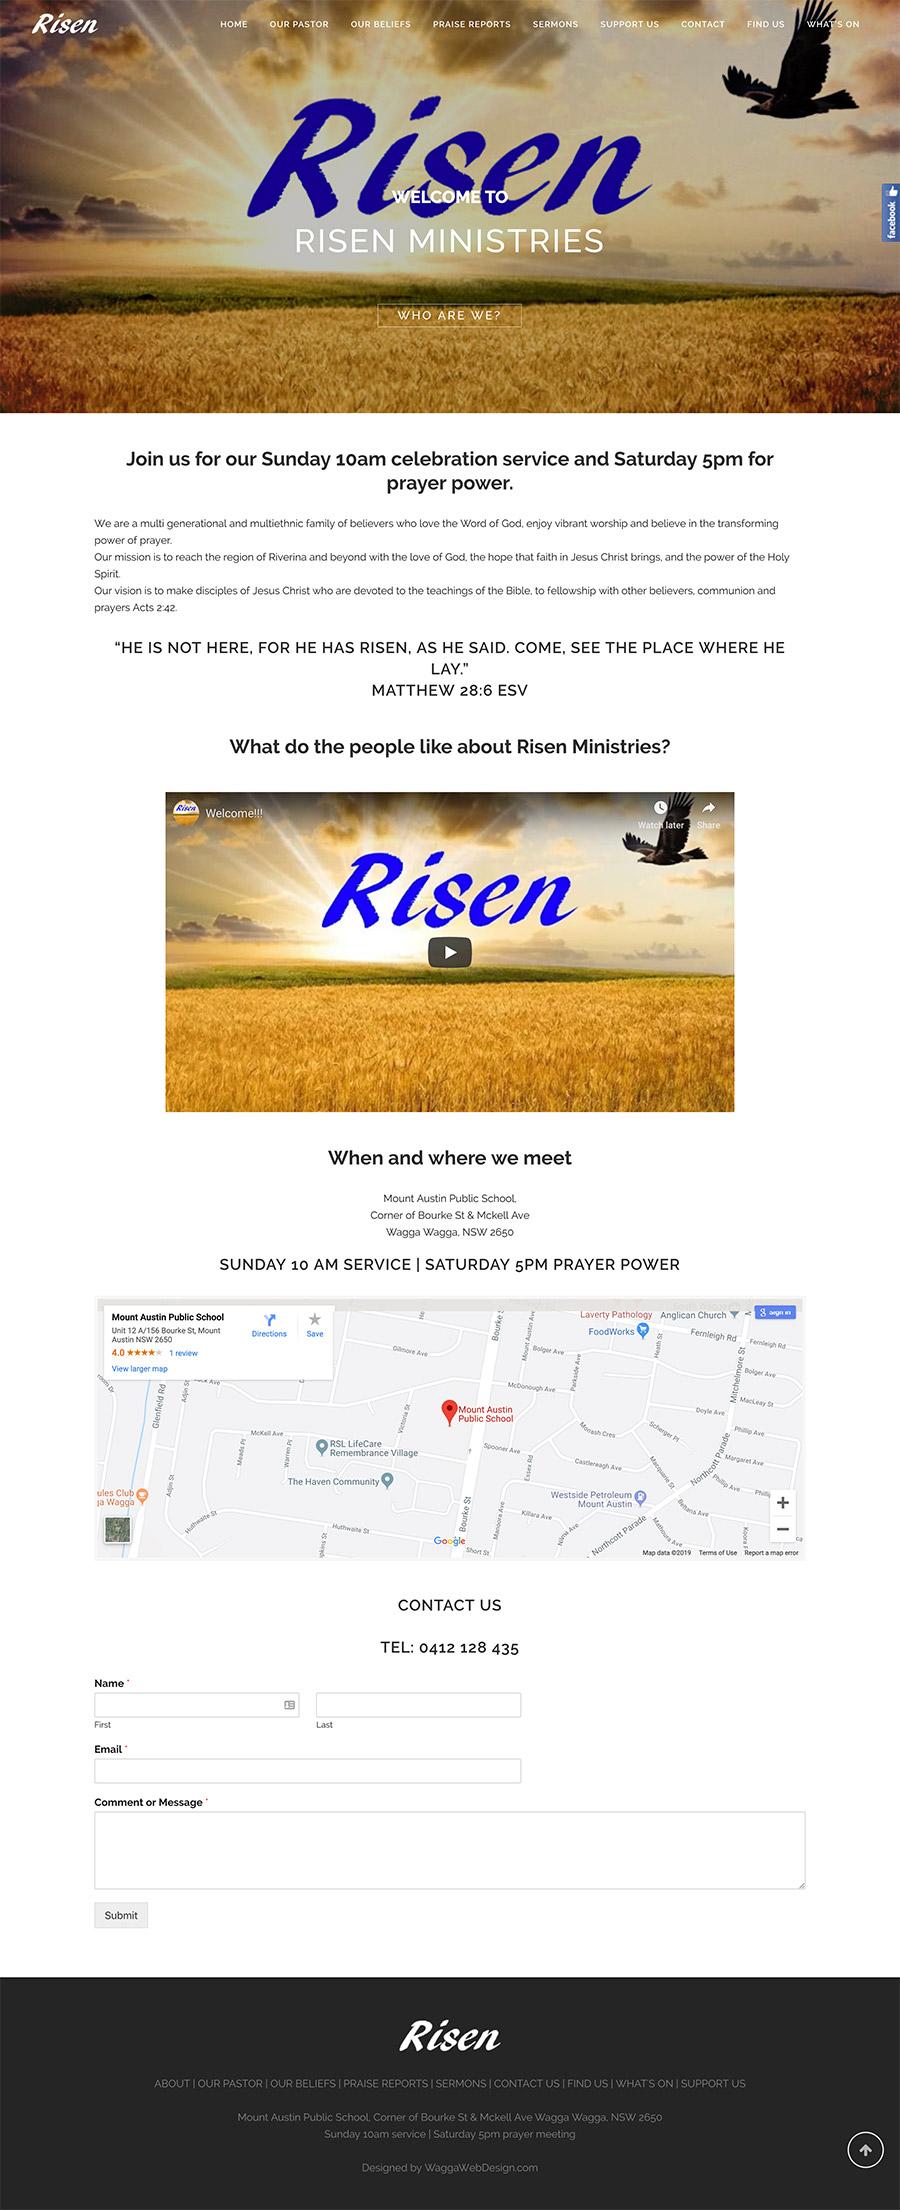 Risen Ministries